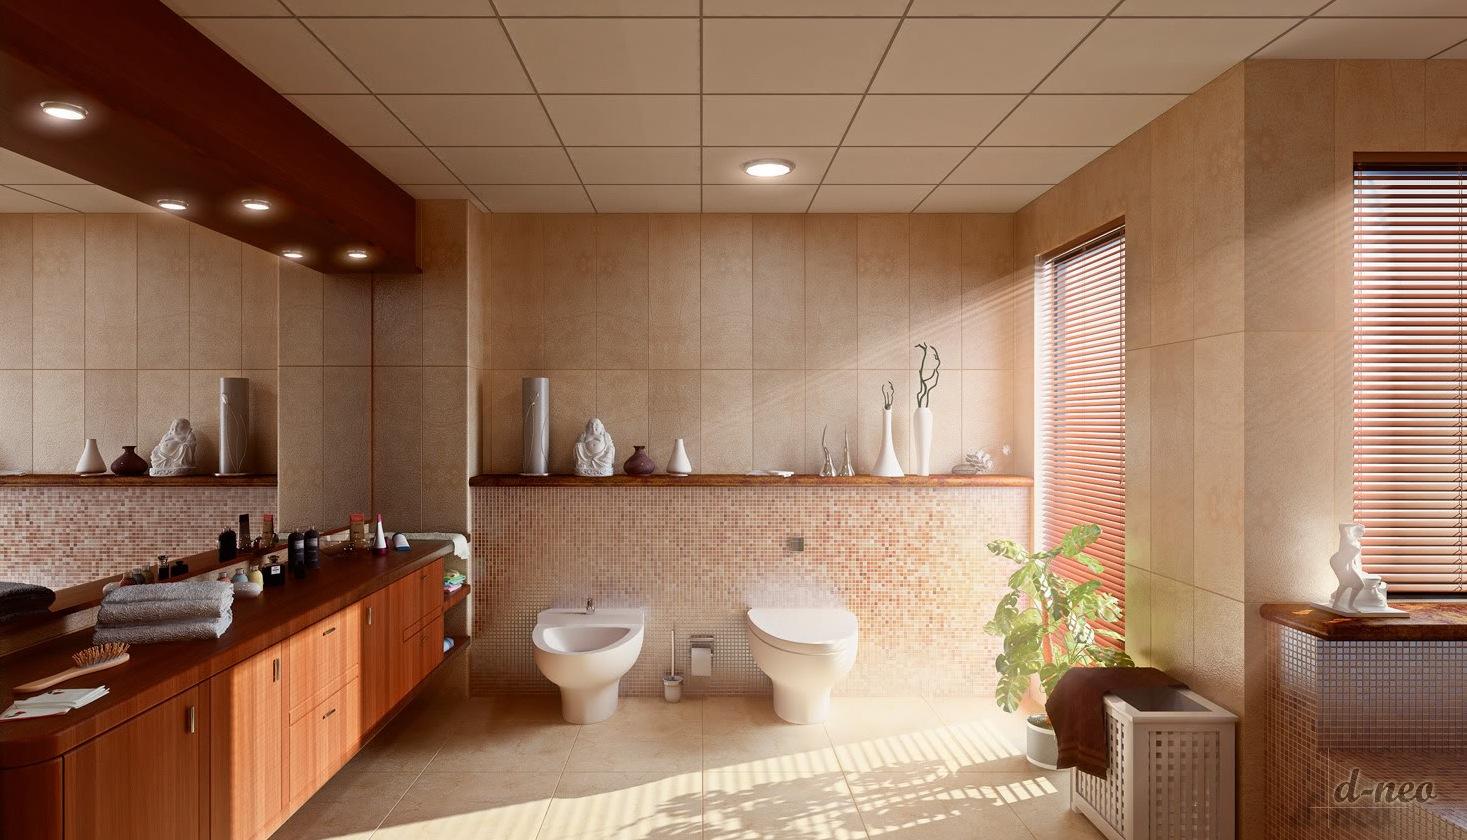 Bathroom Large Mirrors: A Fresh Take On Bath Tubs